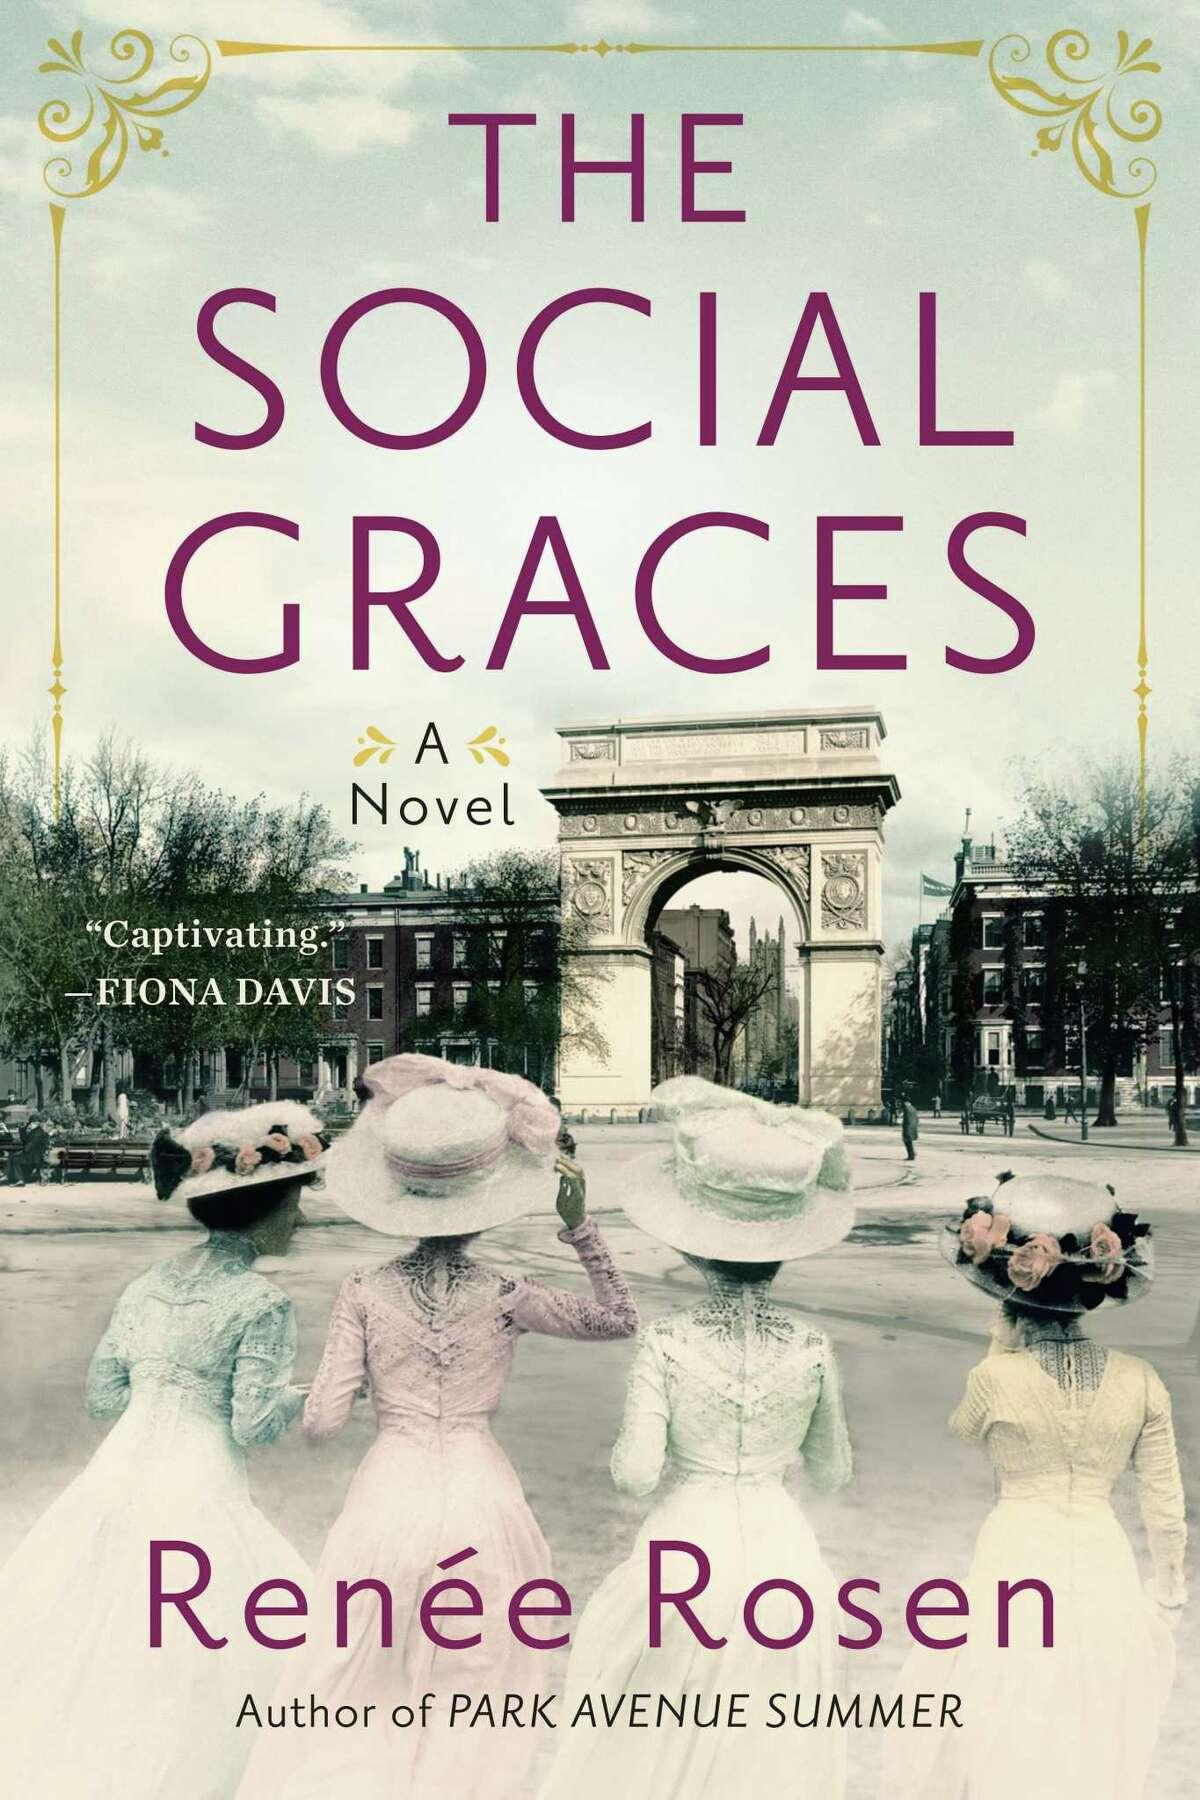 """The Social Graces"" by Renee Rosen"